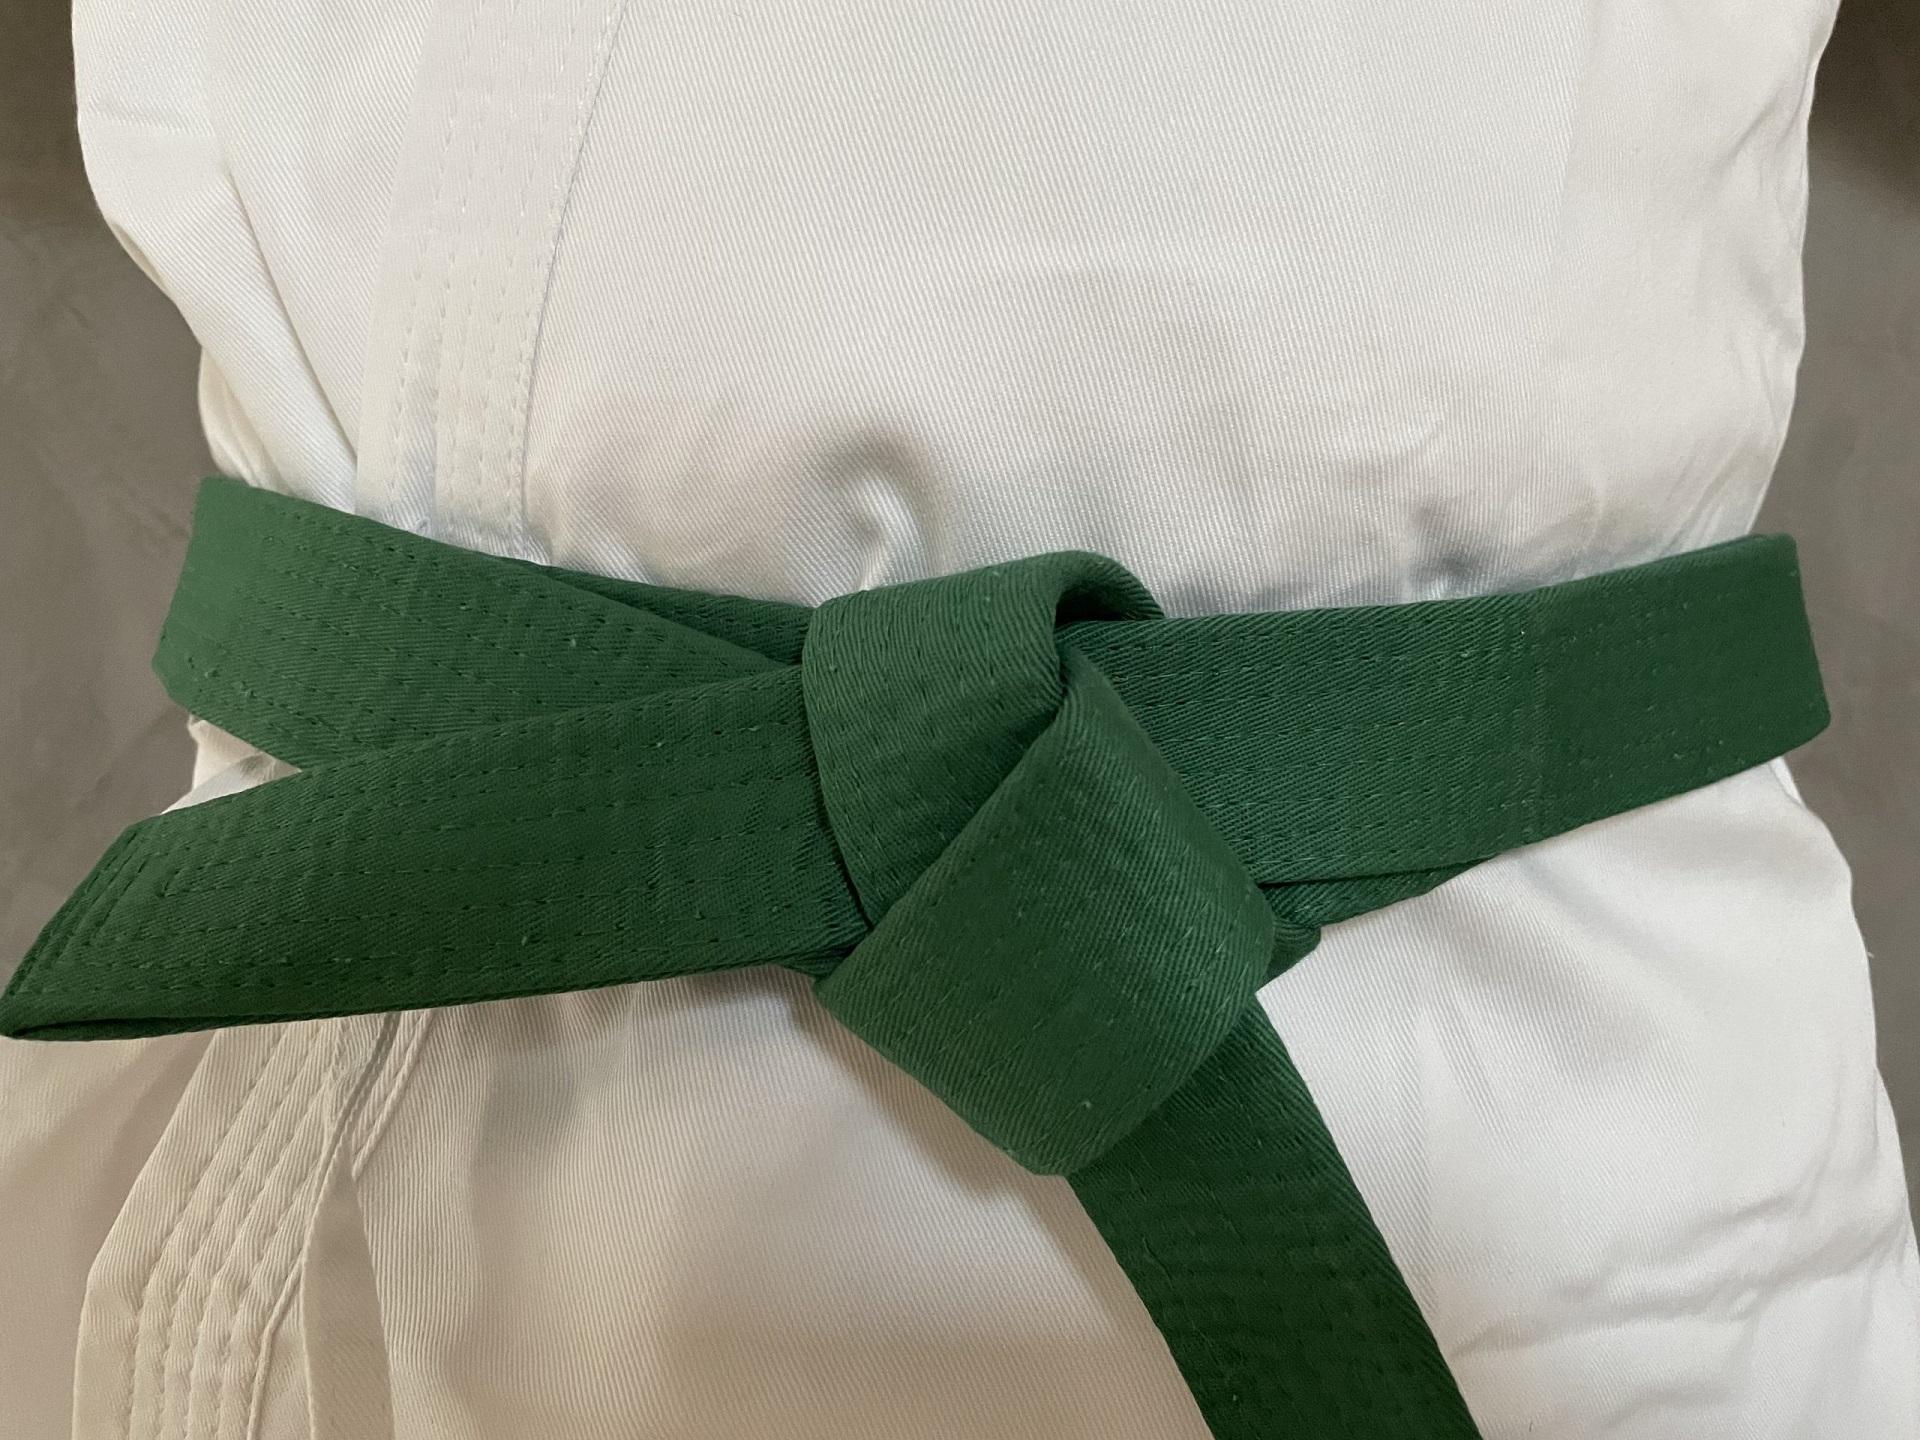 LSS Washington -Lean Six Sigma Green Belt